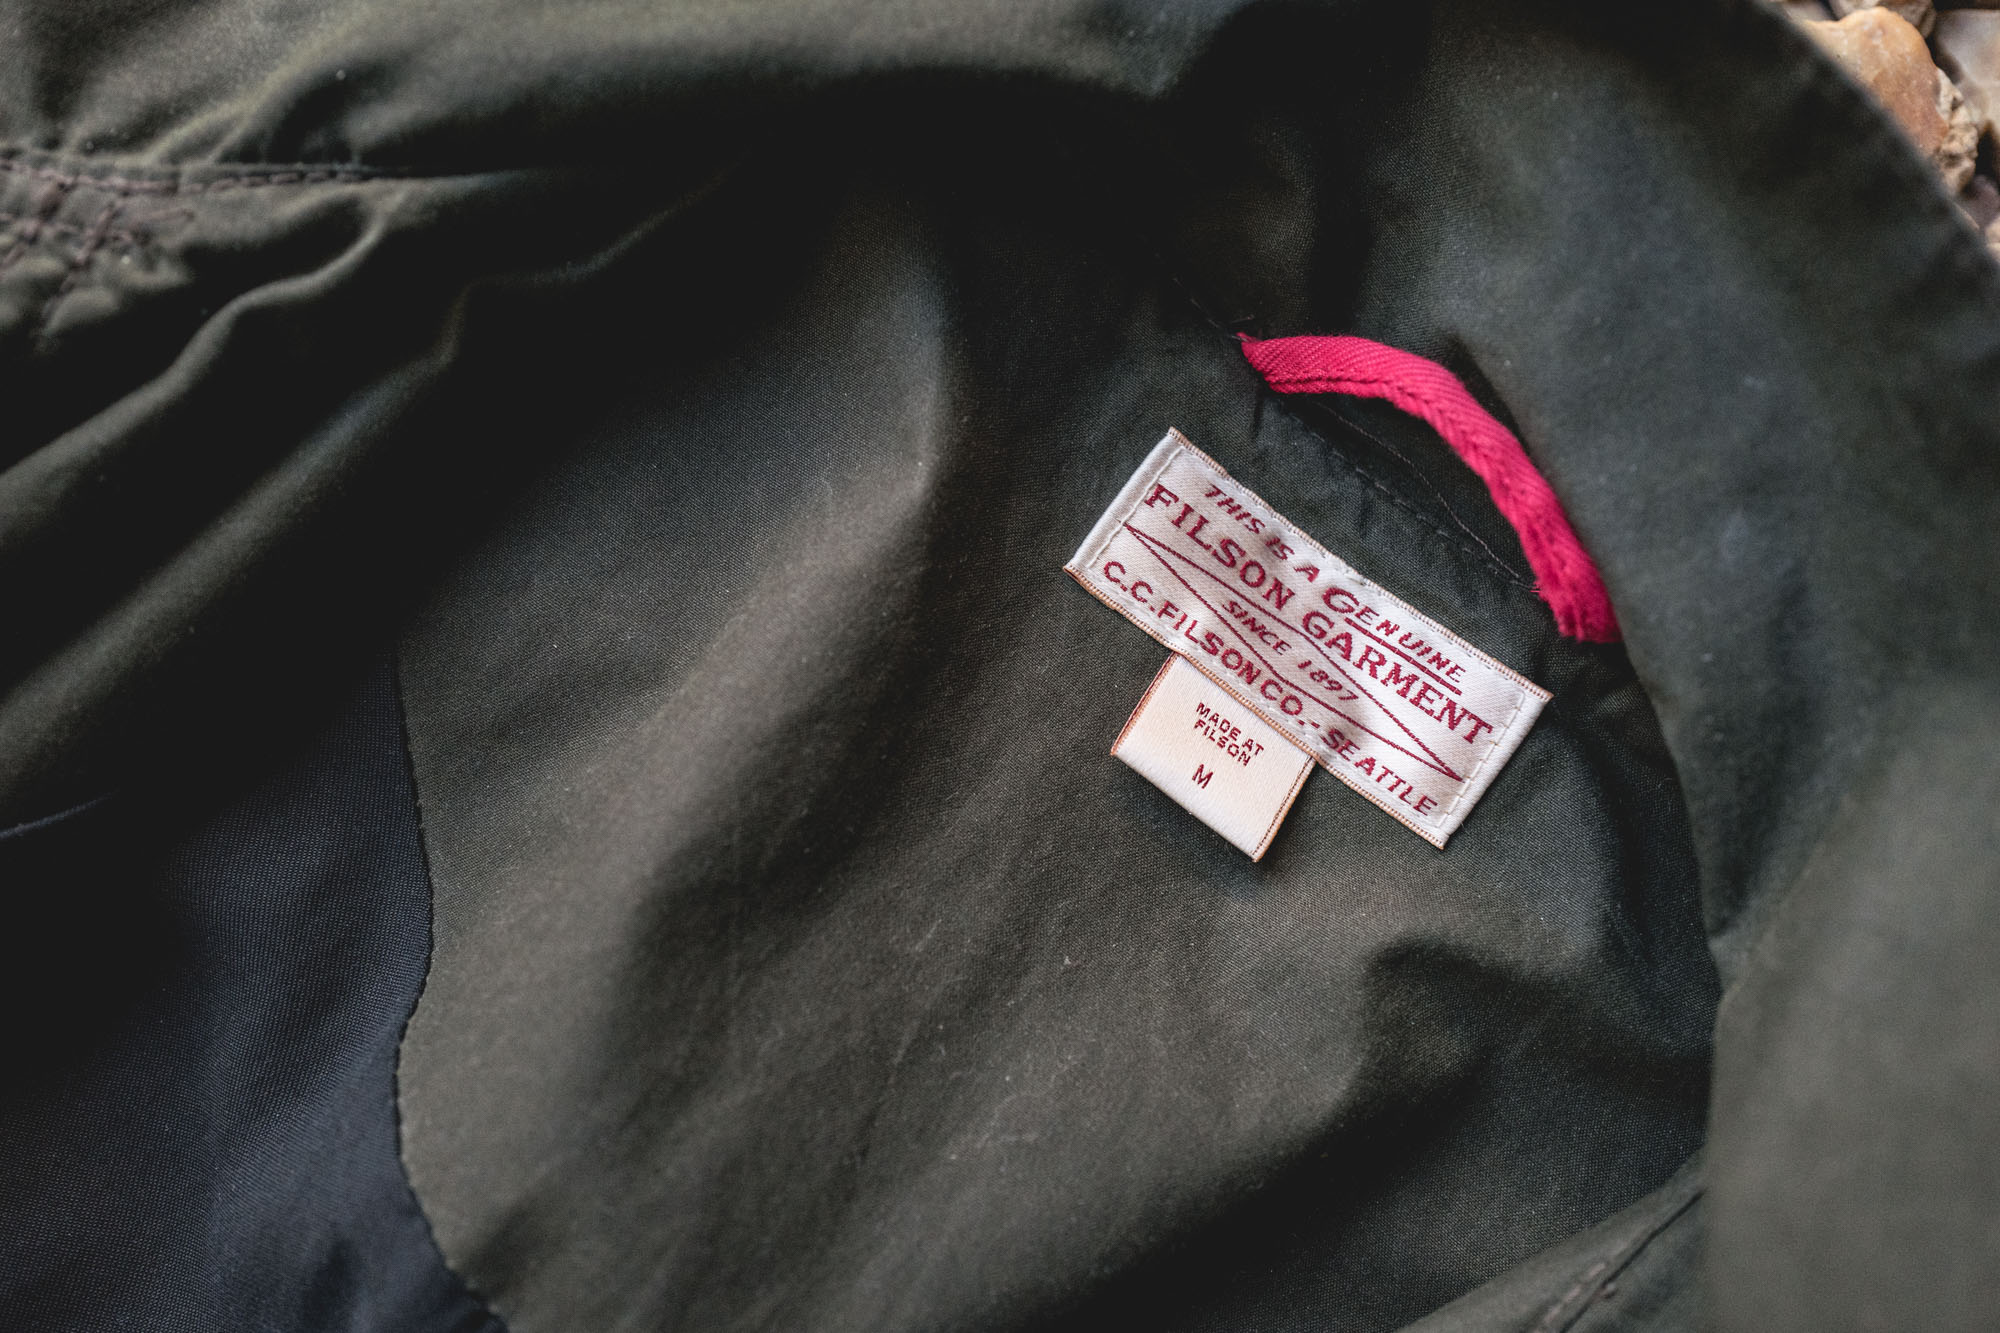 Filson 10475 Waxed Jacket - Filson USA